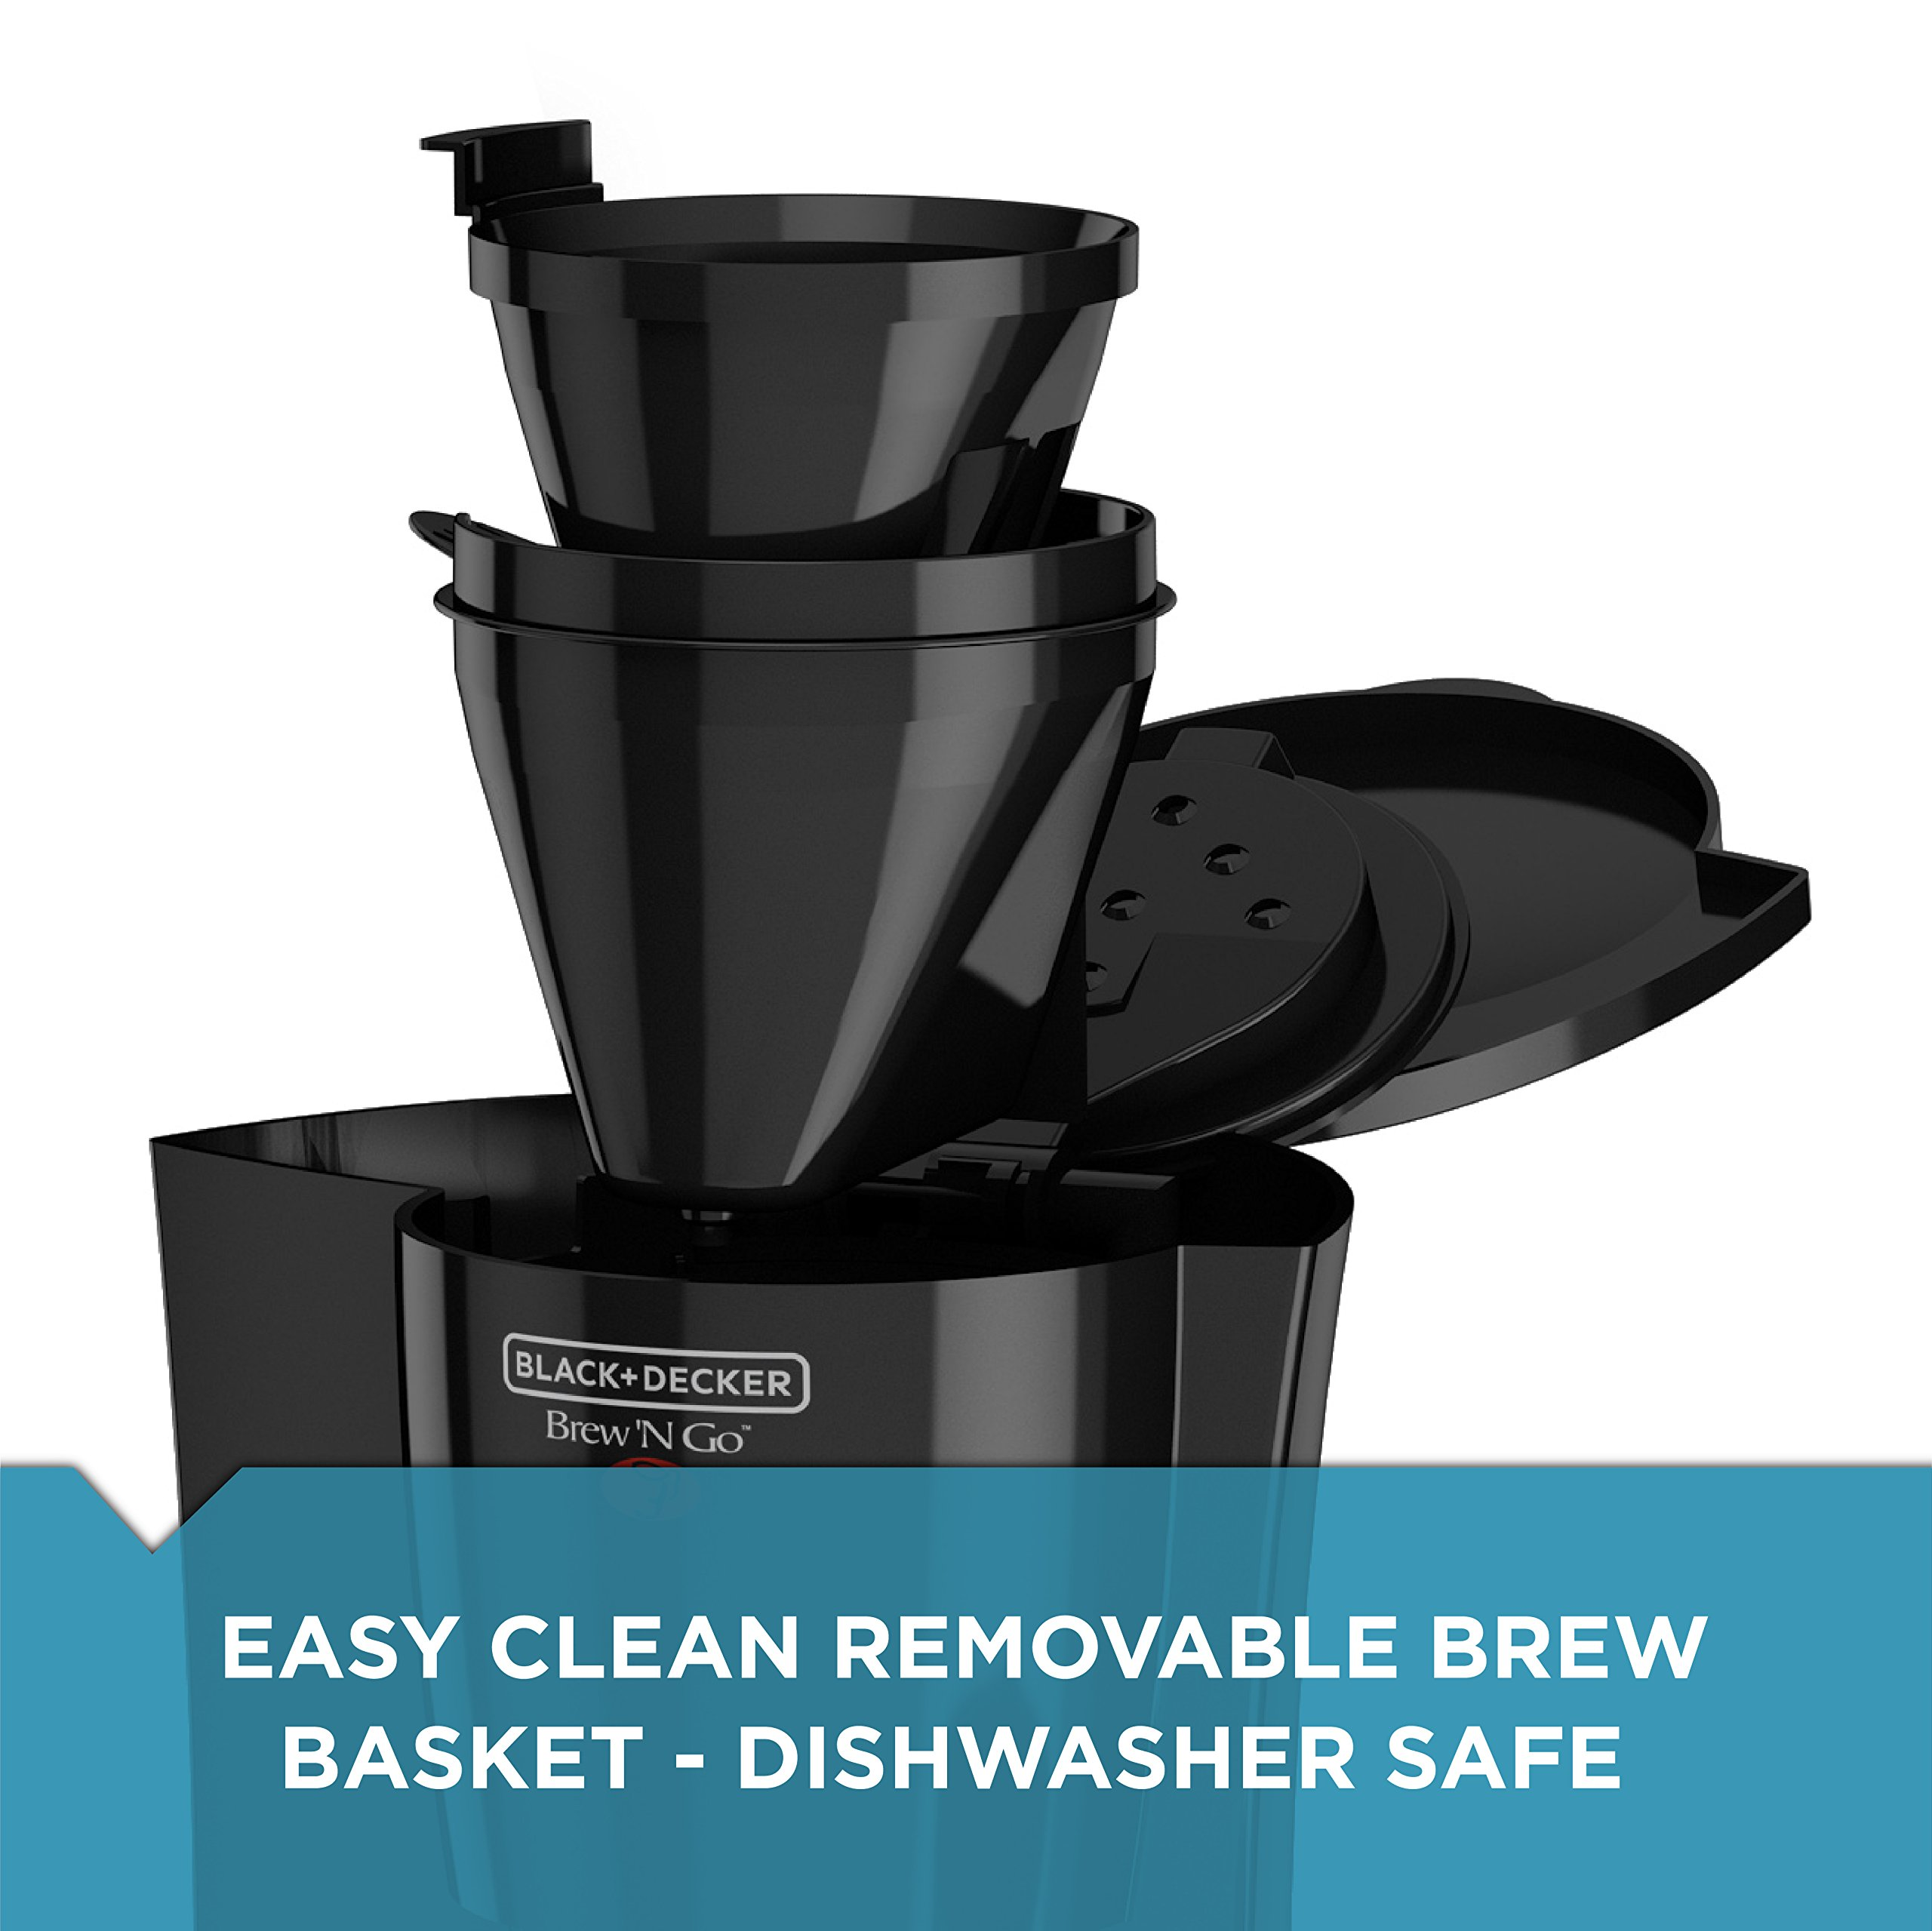 BLACK+DECKER DCM18S Brew 'n Go Personal Coffeemaker with Travel Mug, Black/Stainless Steel by Black & Decker (Image #4)